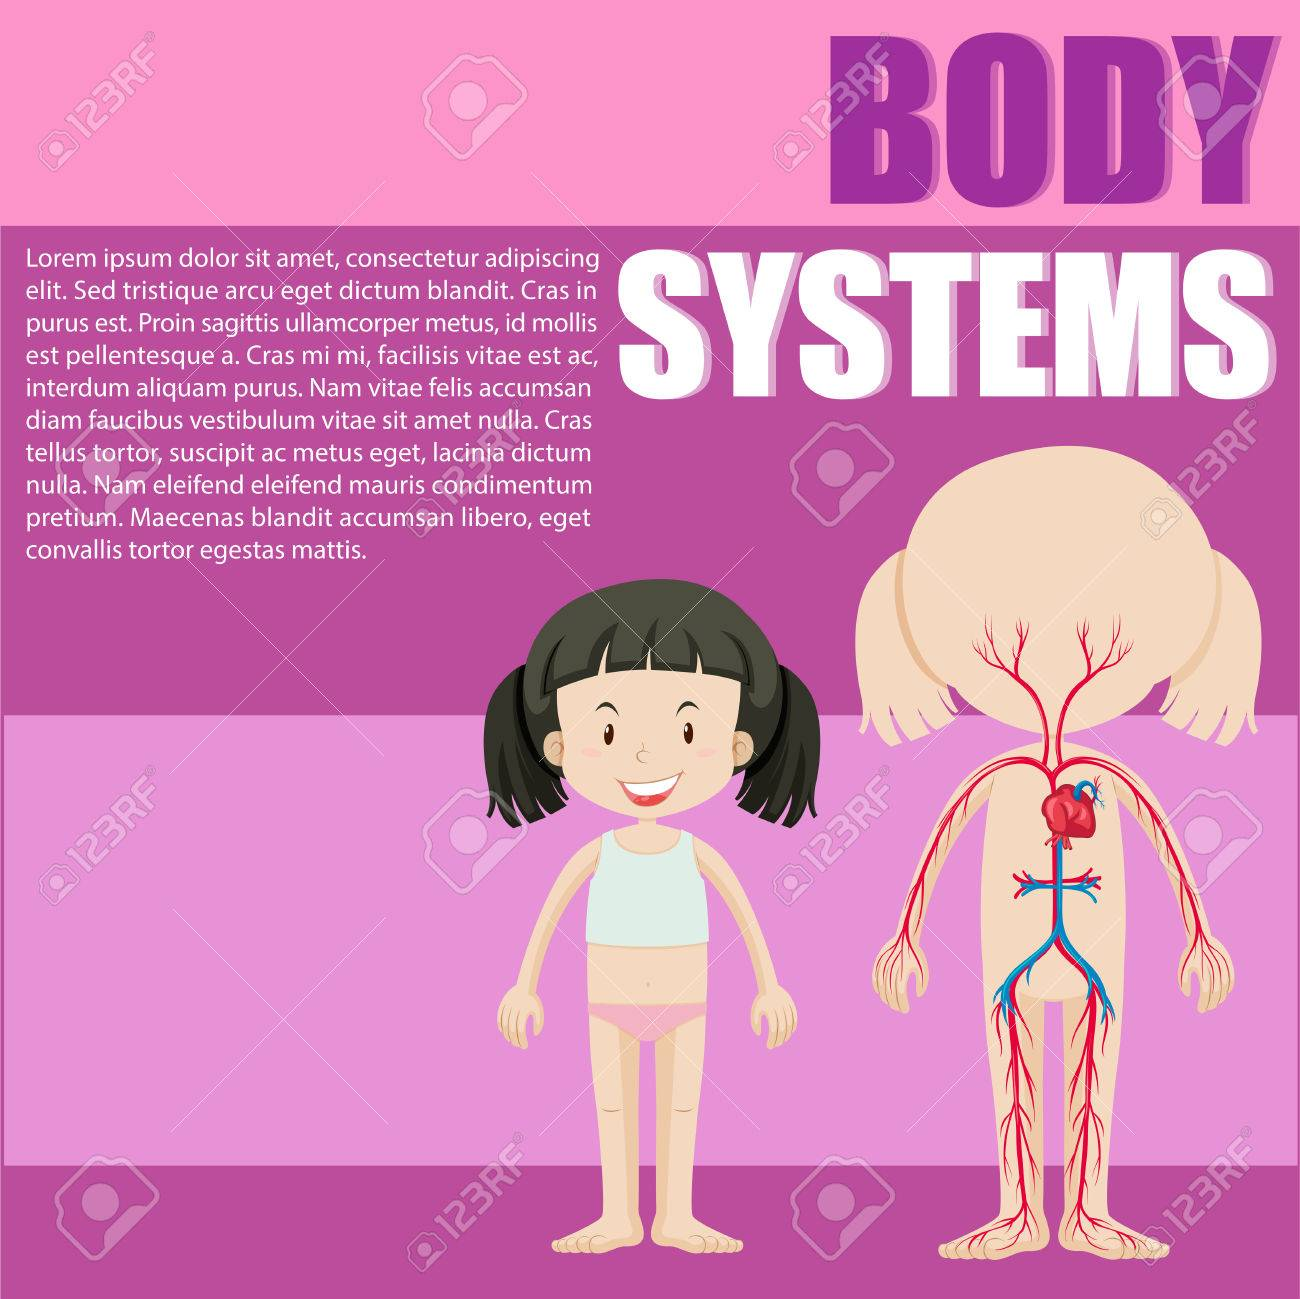 Body system of a girl illustration - 52039423